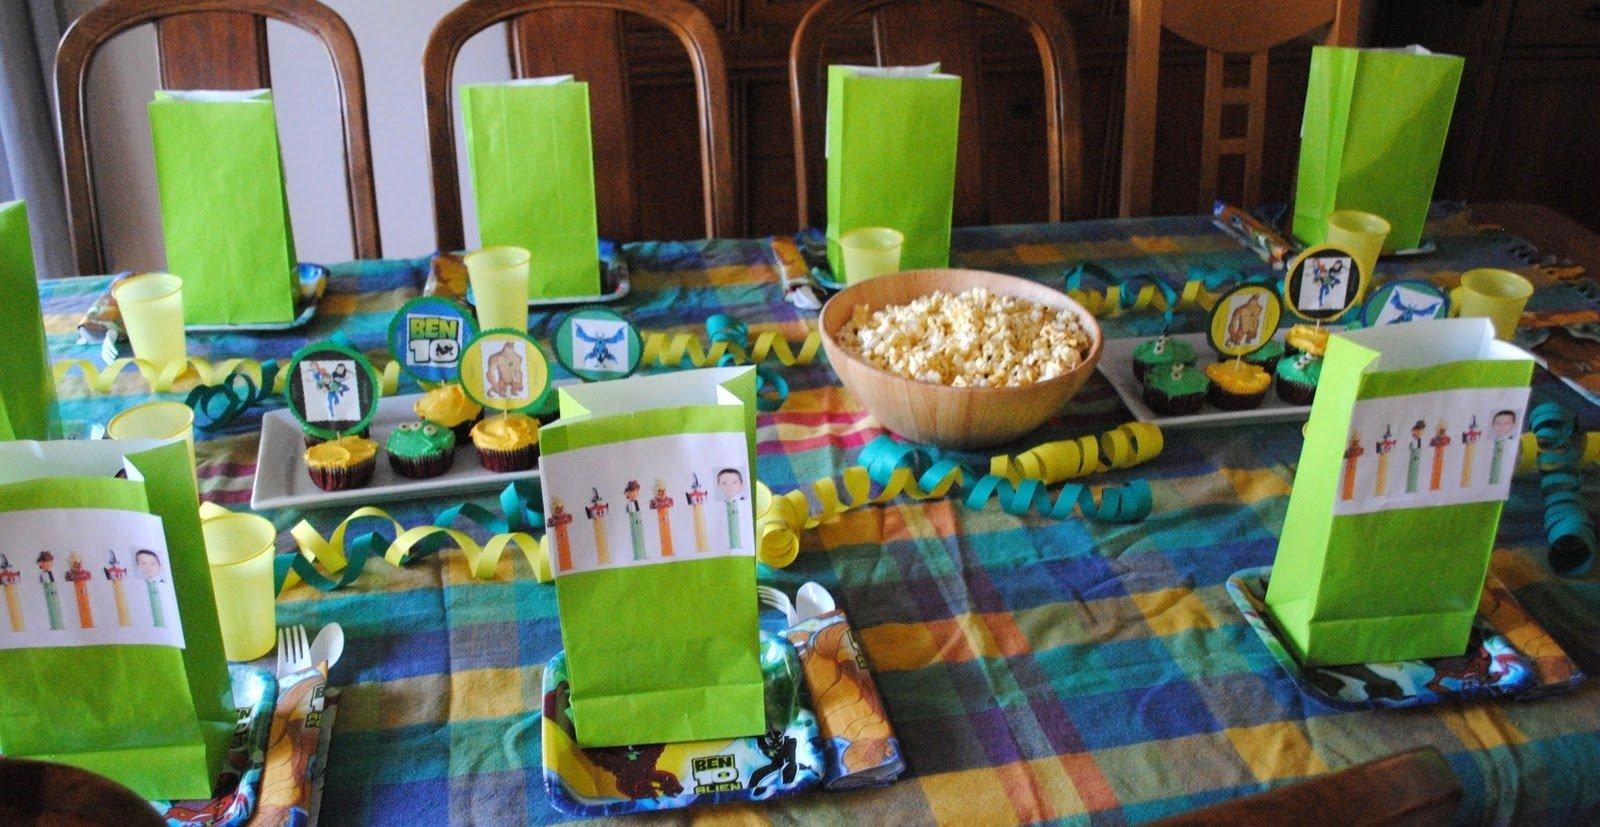 10 Trendy Ben 10 Birthday Party Ideas a ben 10 birthday party beatnik kids 2